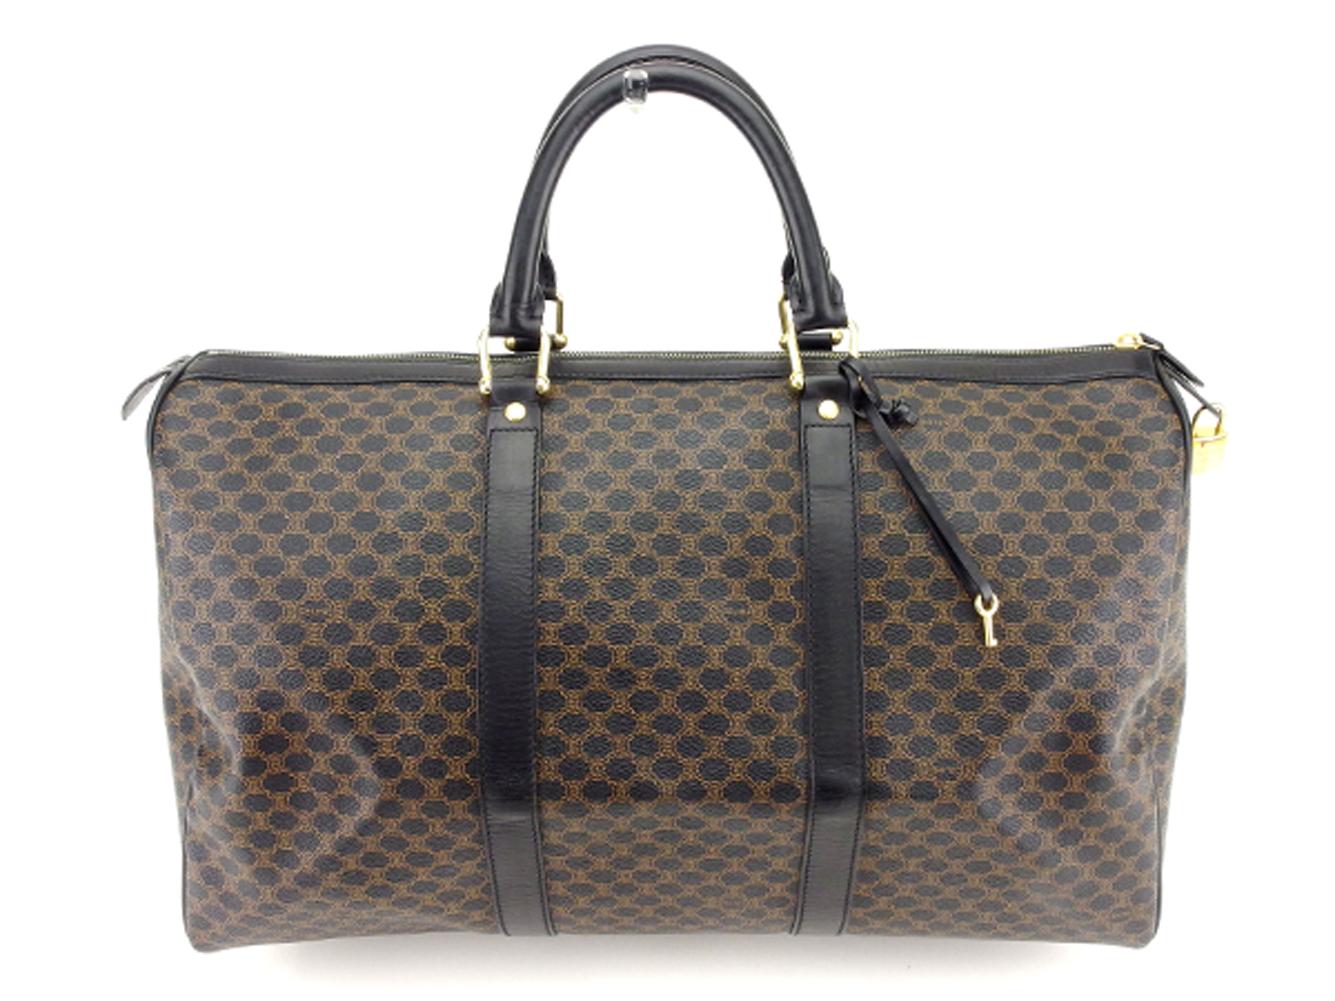 00b0923beb BRAND DEPOT  Celine CELINE Boston bag travel bag traveling bag lady s men s  possible macadam black beige gold PVC X leather popularity sale T7521